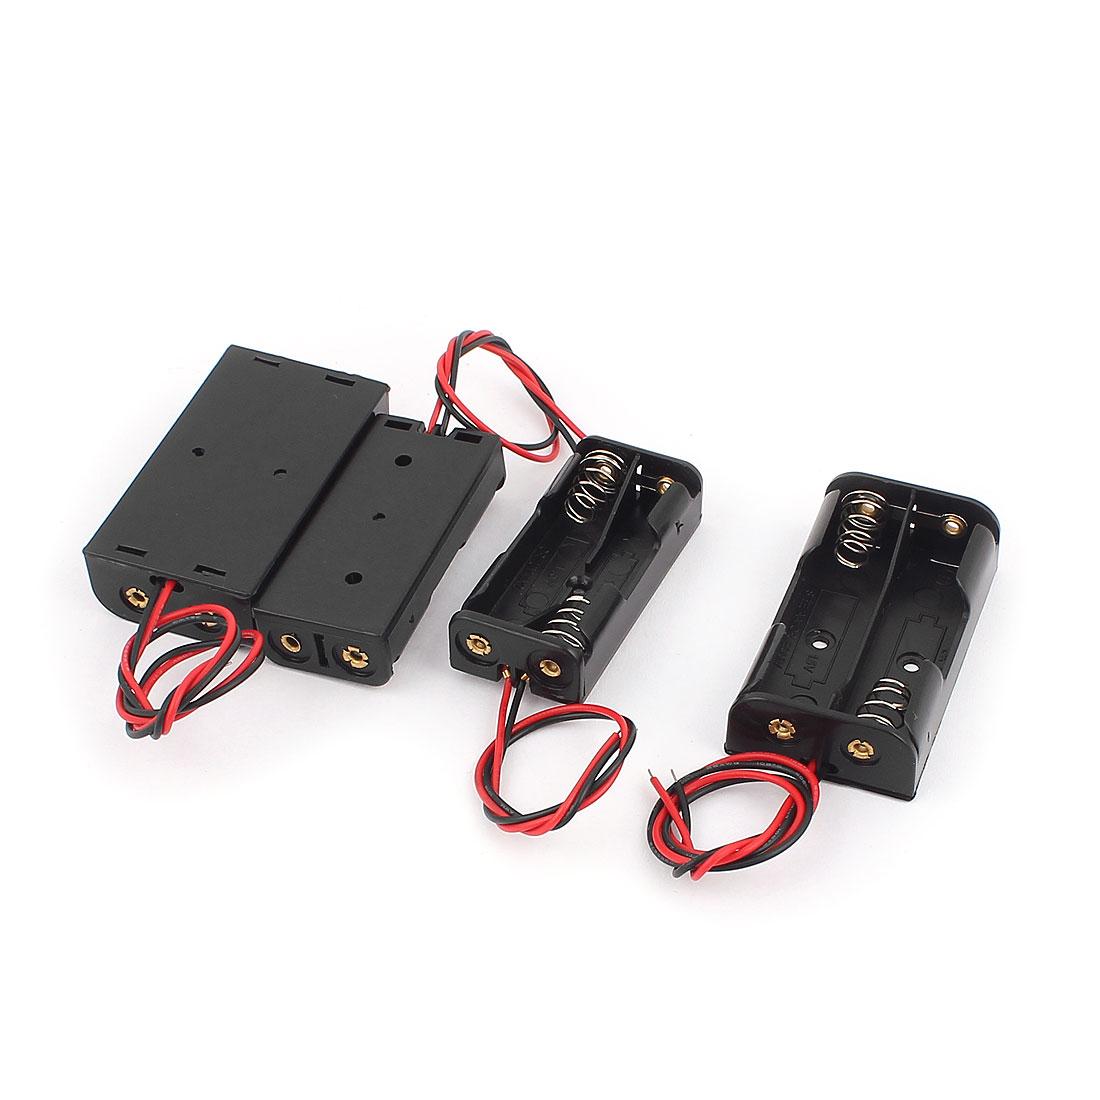 4Pcs Wire Lead 2x1.5V AAA 2x1.5V AA Battery Cell Case Holder Box Black